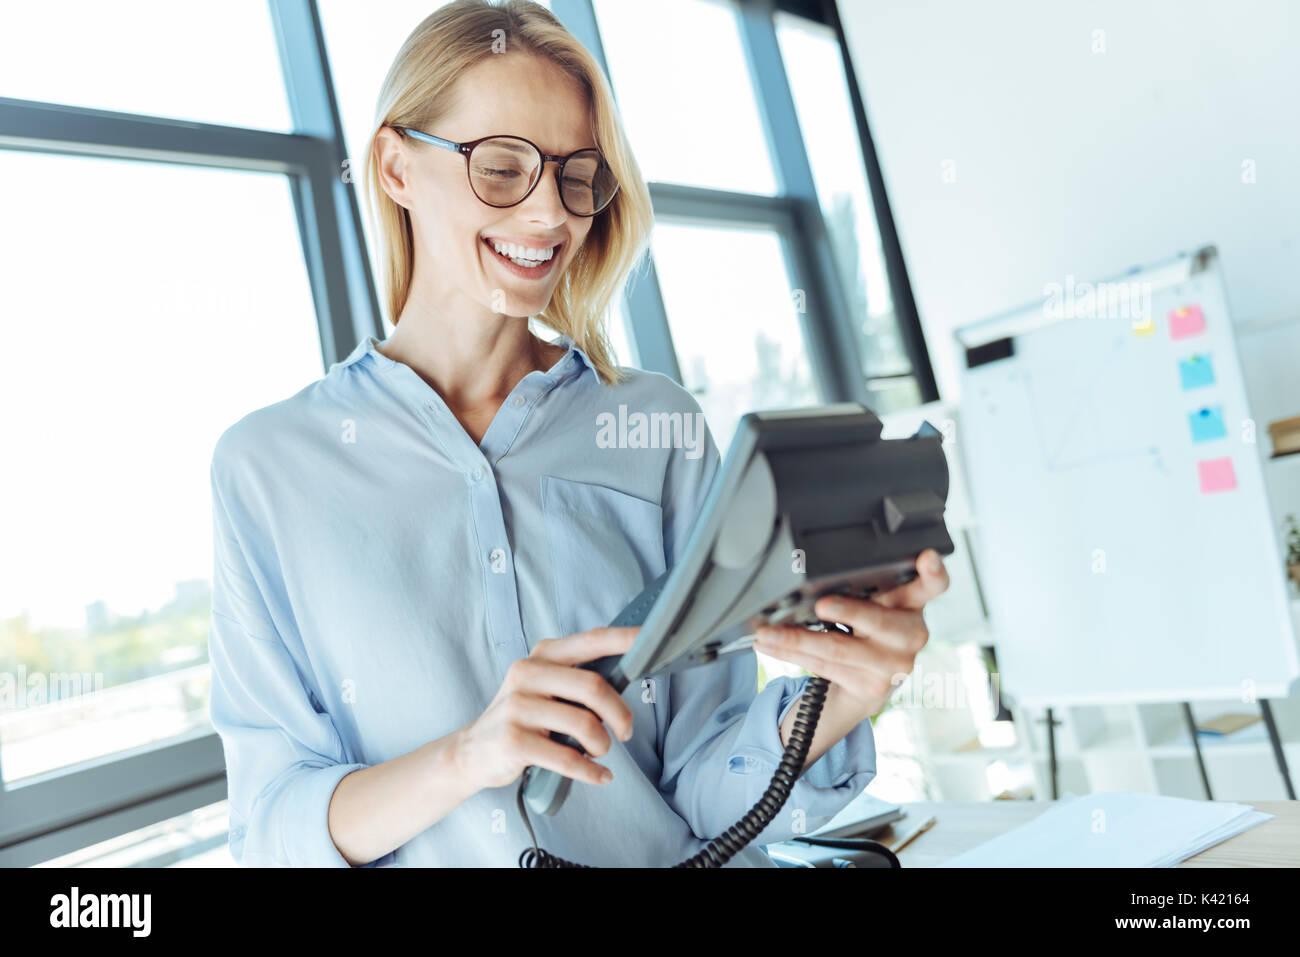 Joyful woman making a call on a landline office phone - Stock Image